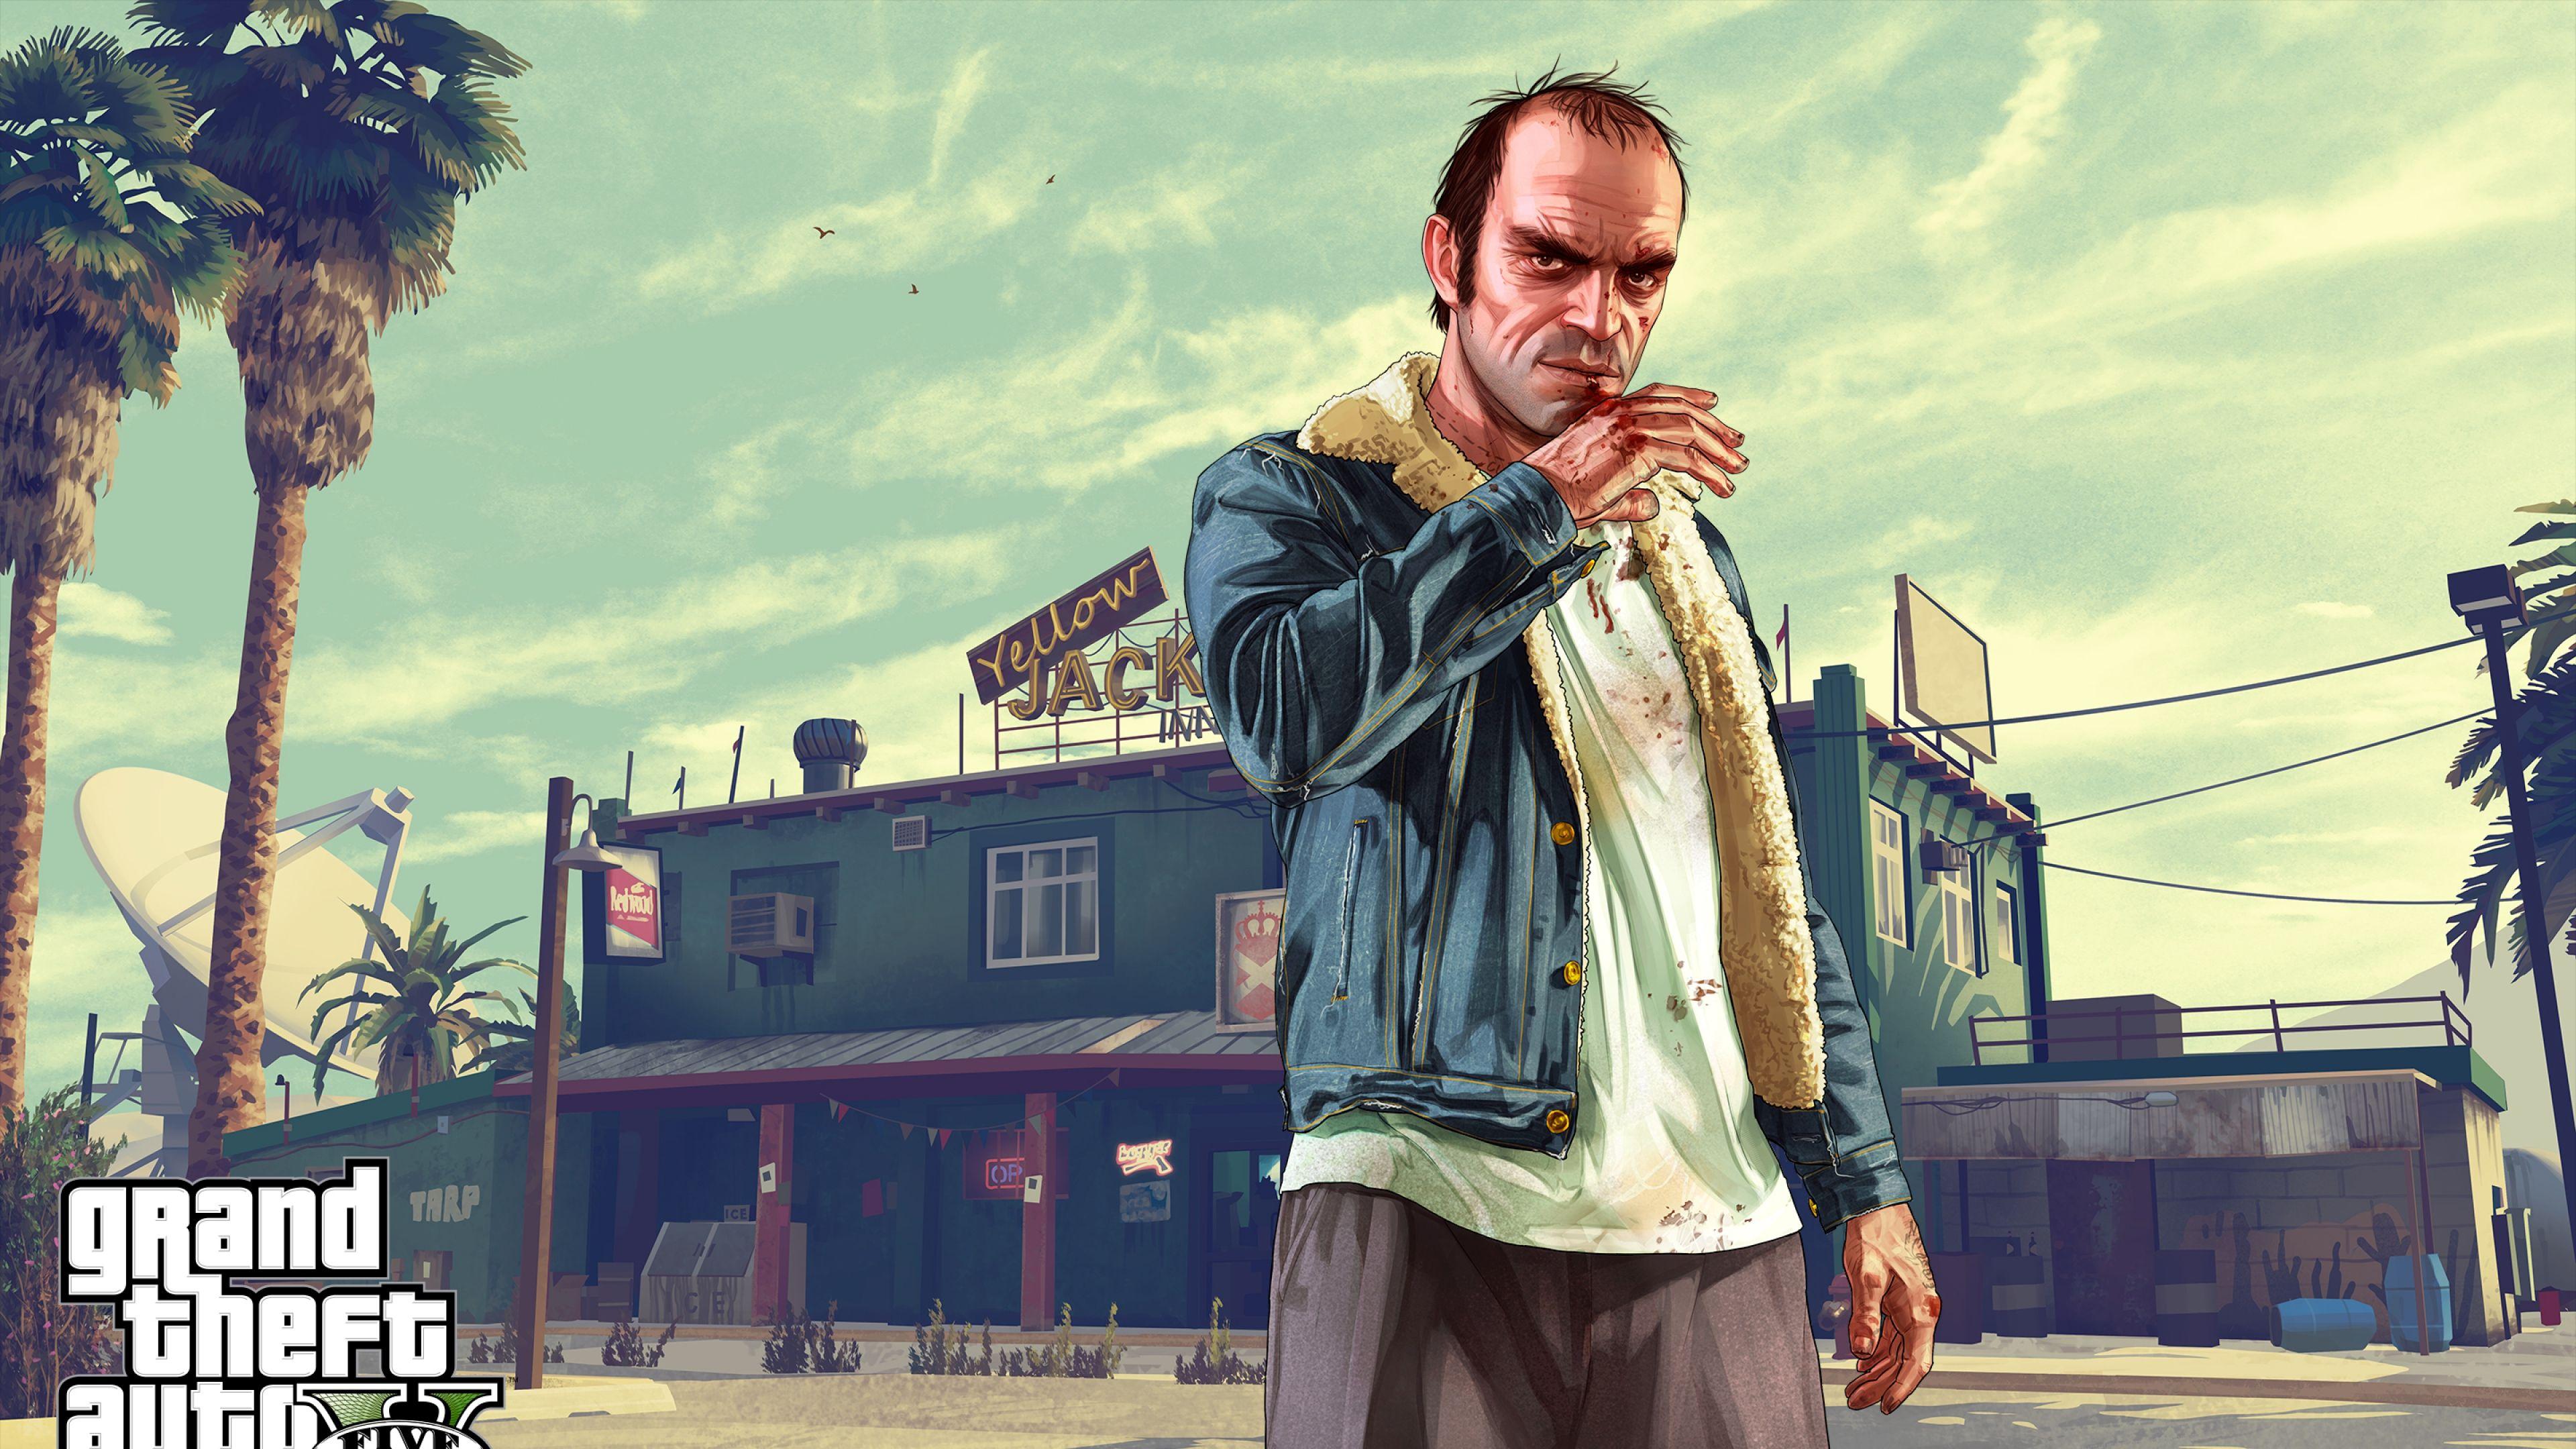 Grand Theft Auto Trevor 4k Hd Wallpapers Grand Theft Auto Gta Trevor Philips